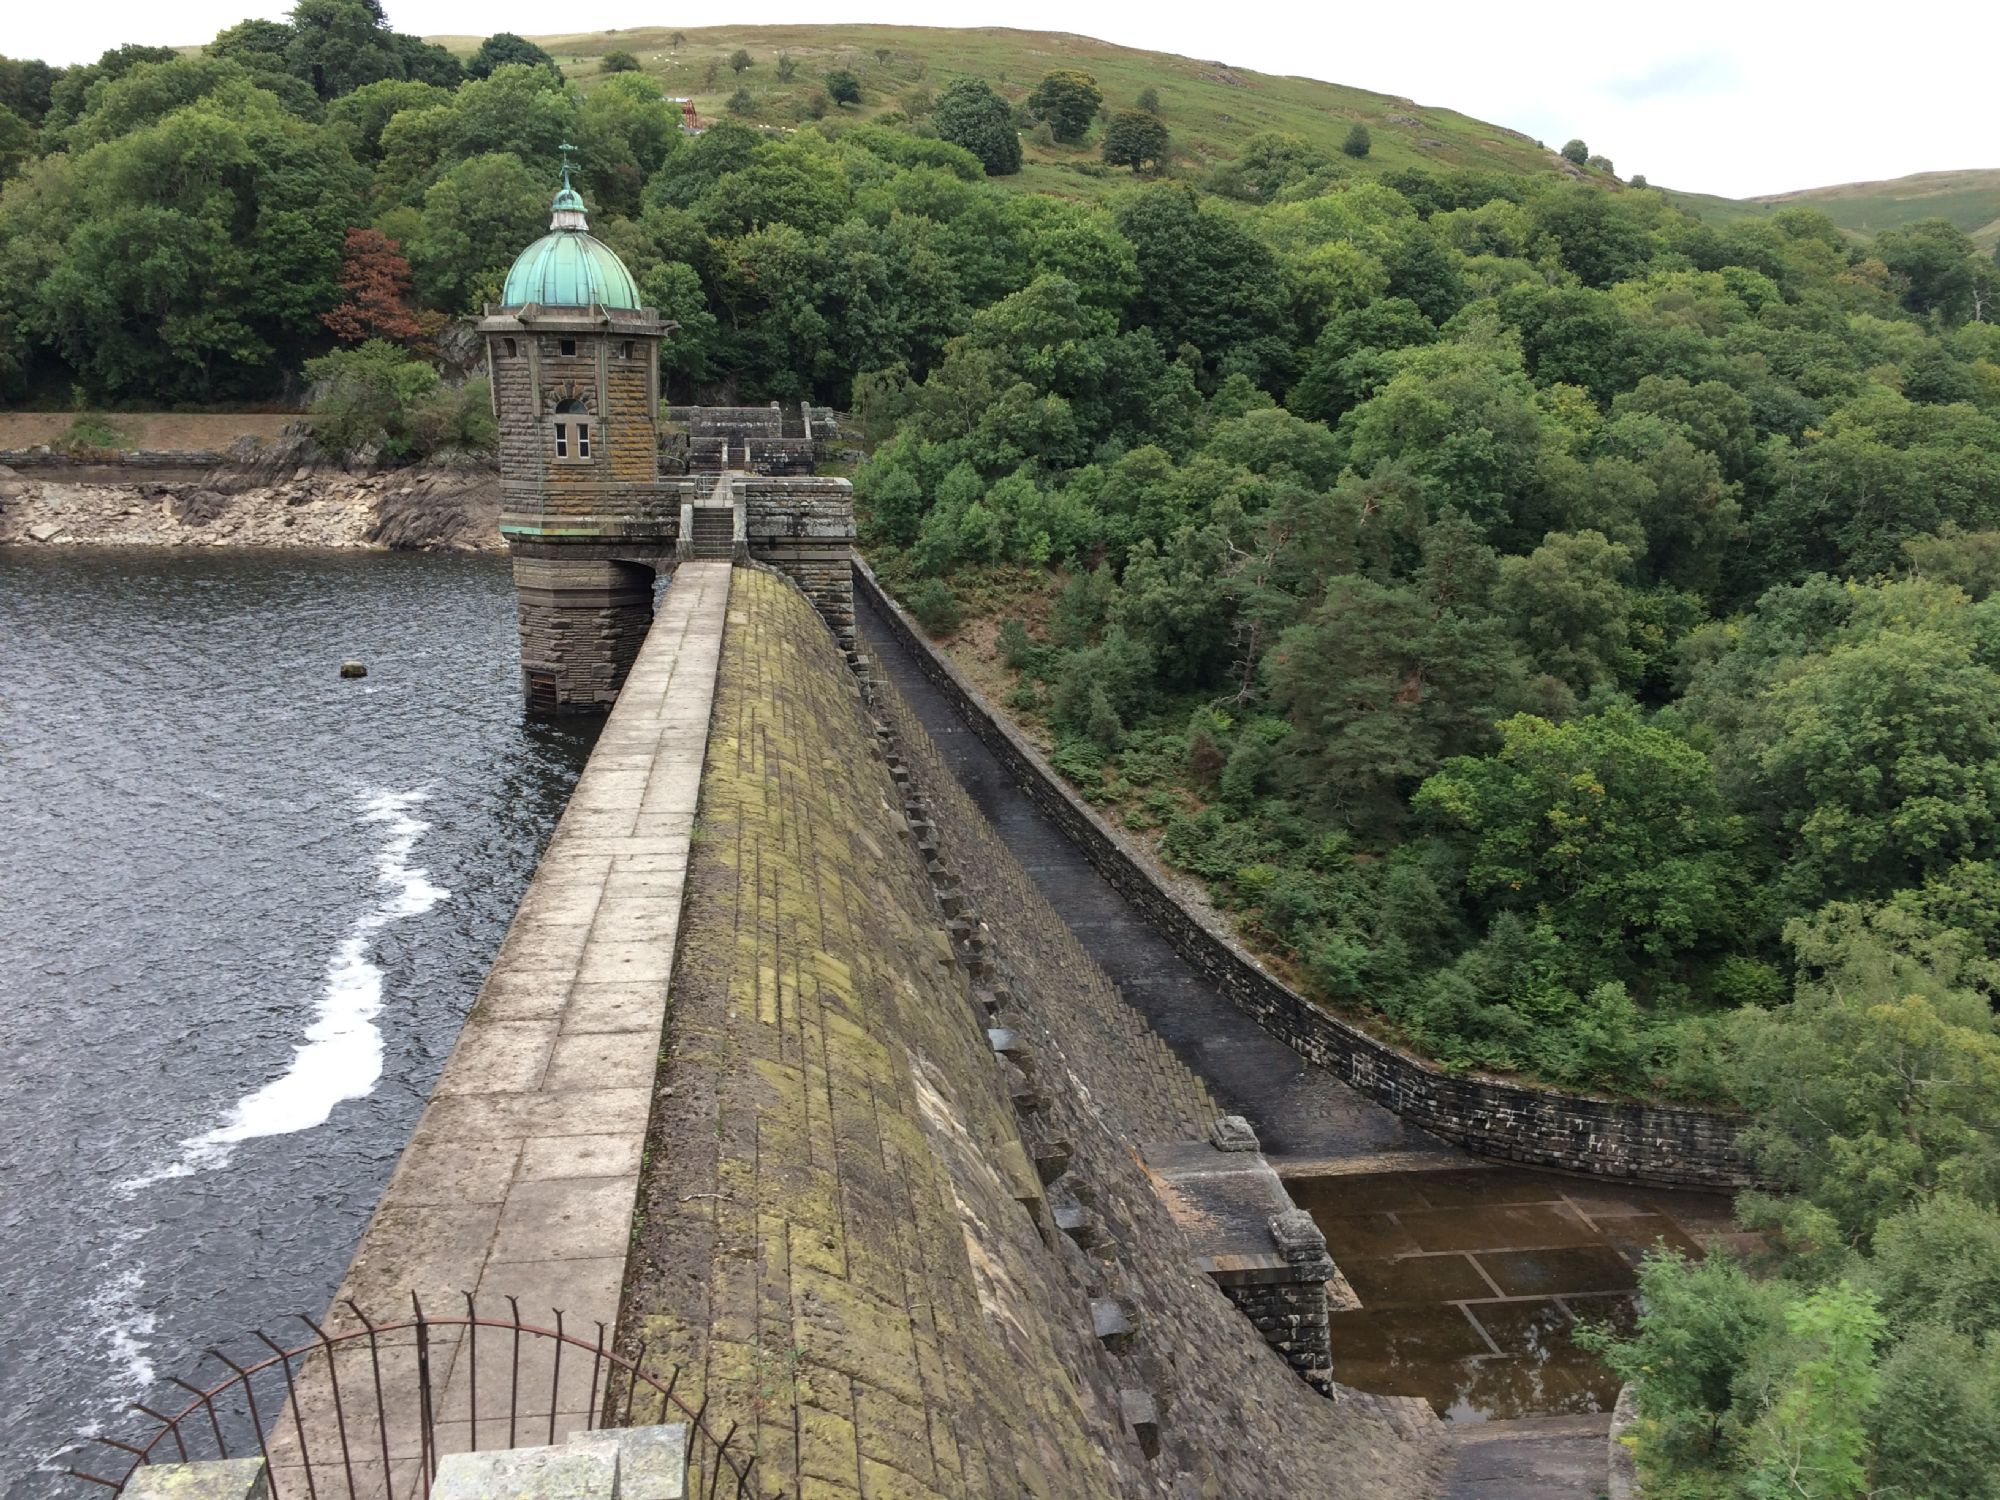 Elan Valley reservoir dam